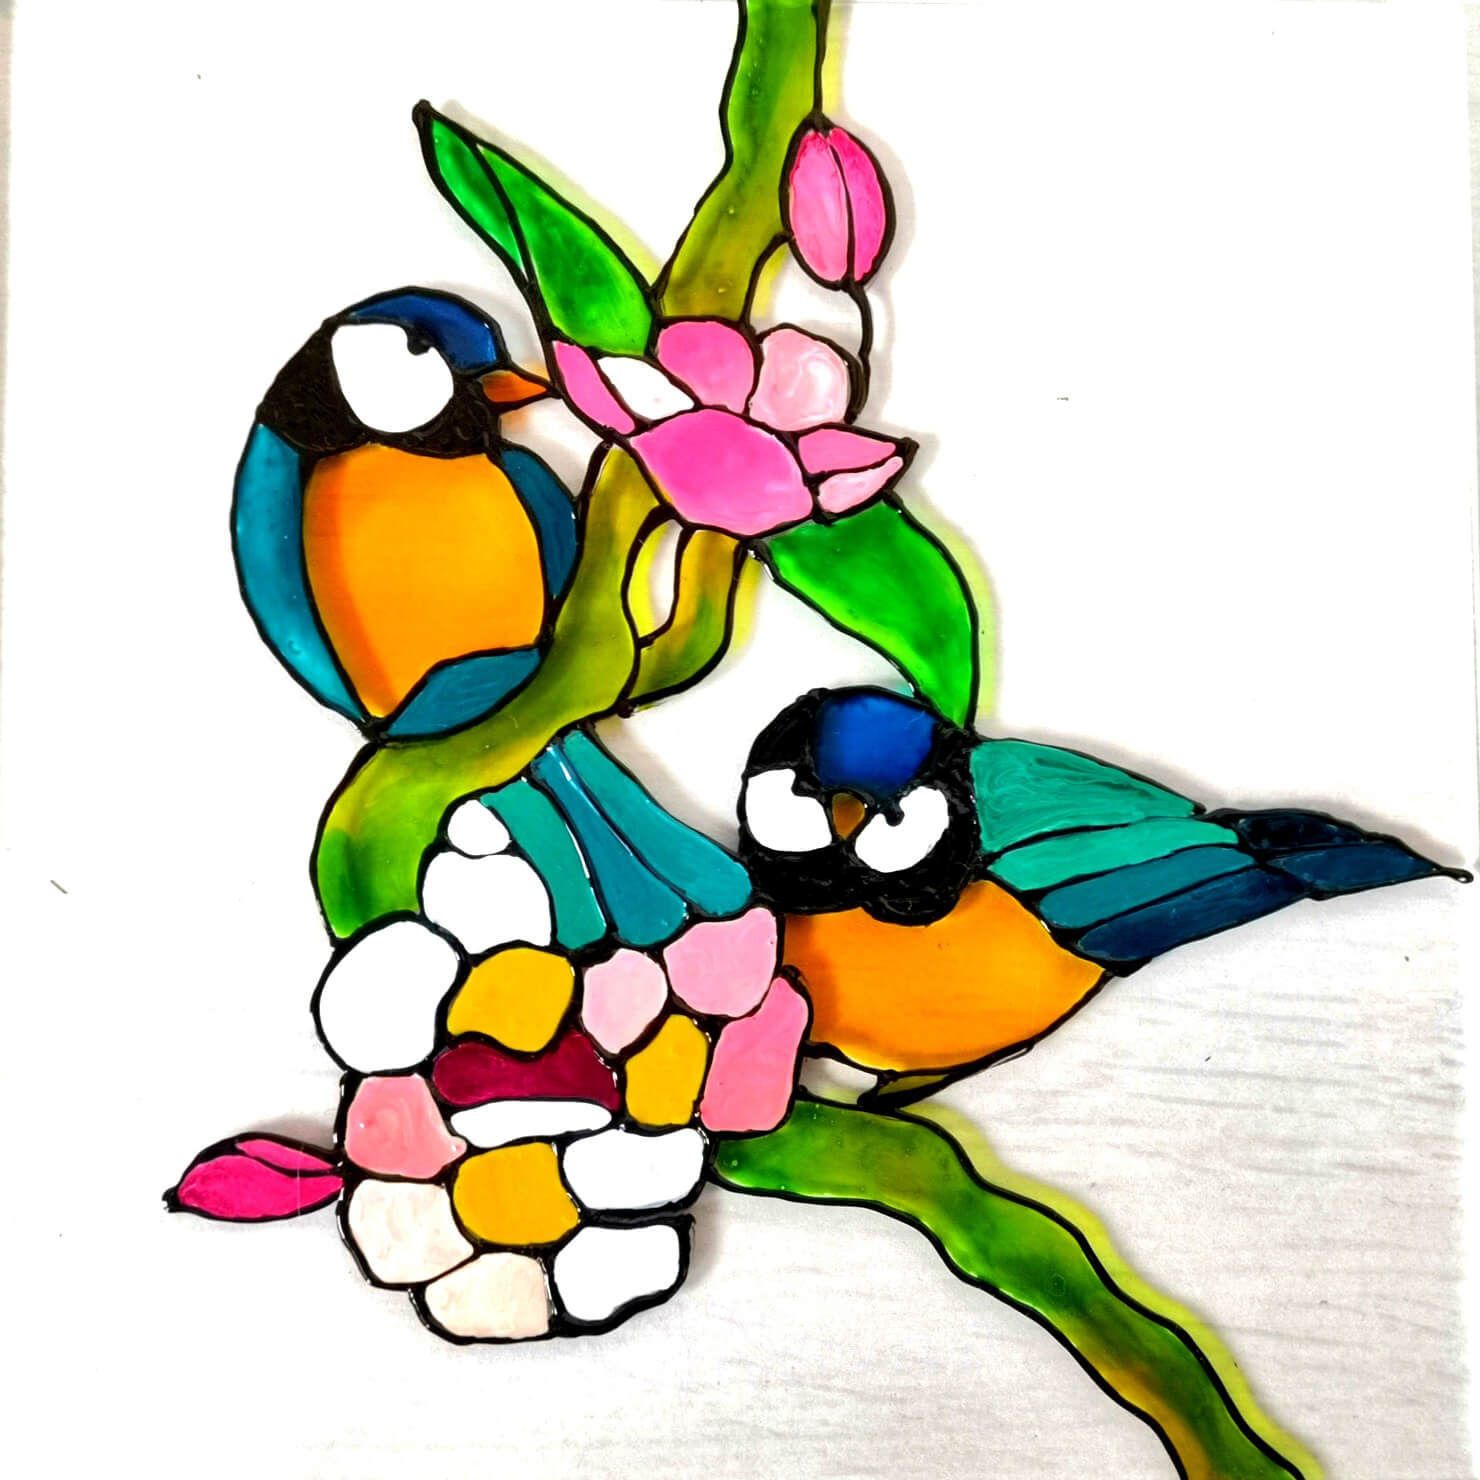 ptichka na cvetna klonka